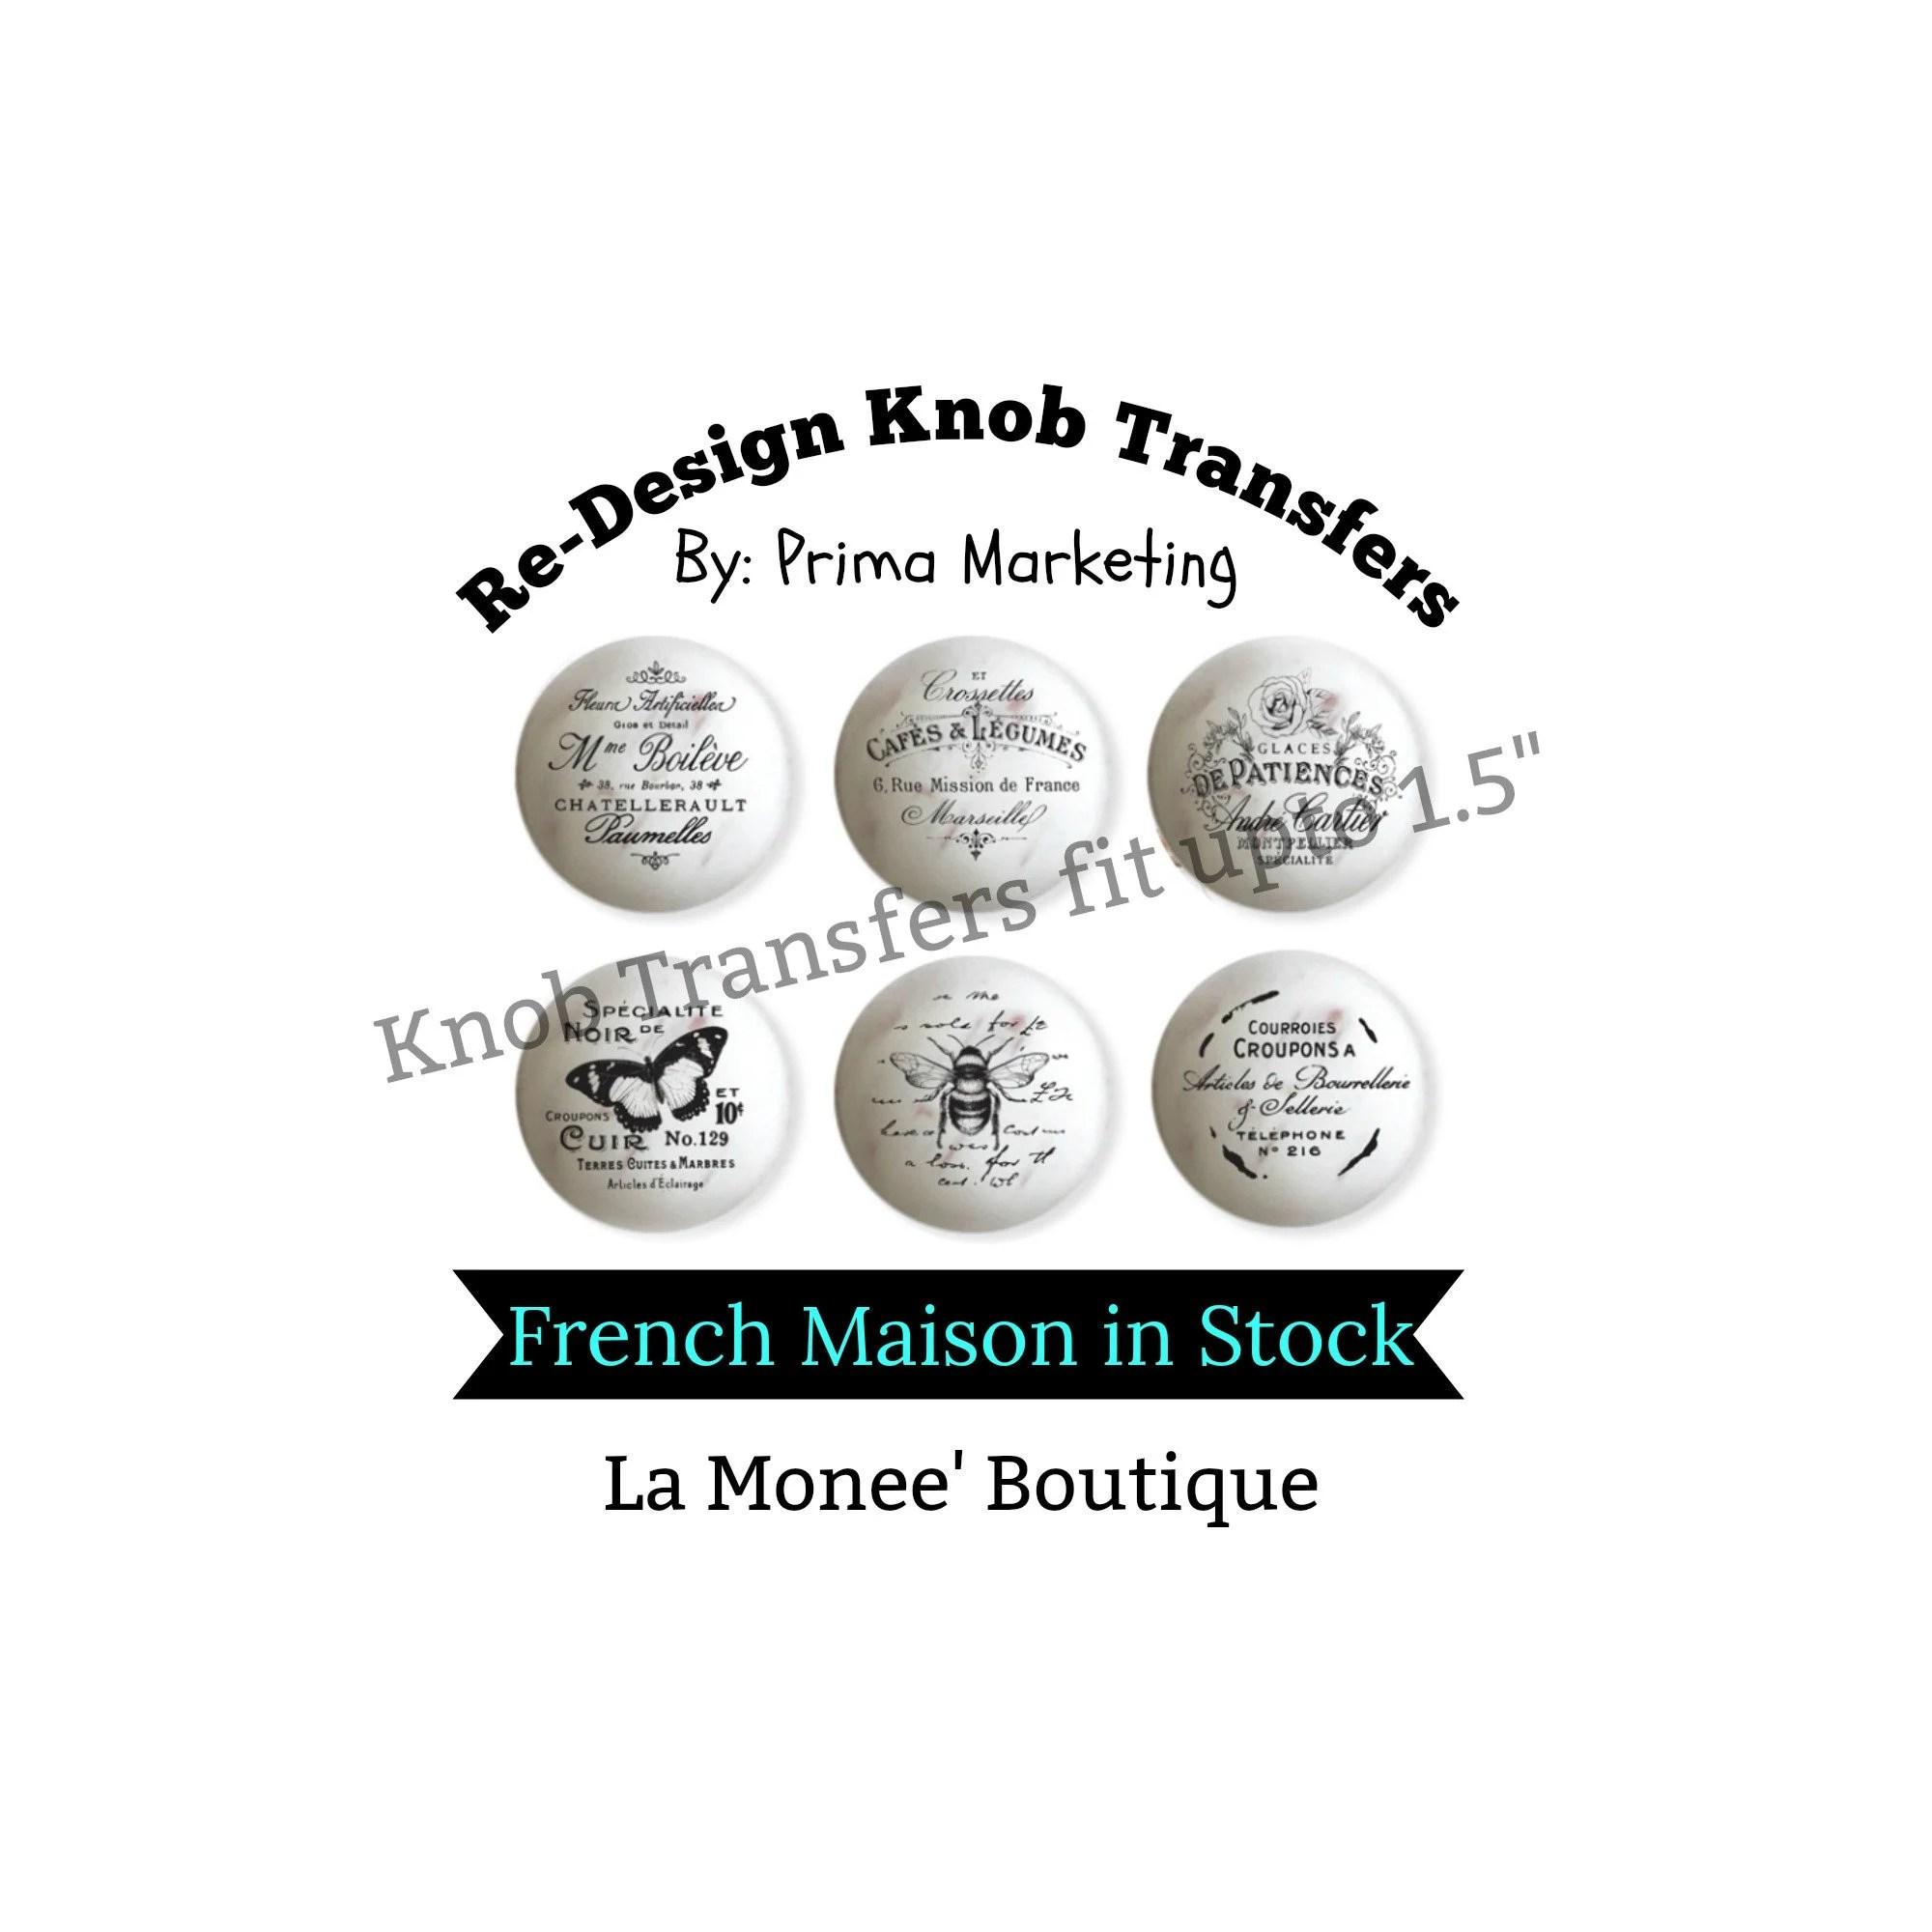 Redesign Knob Transfer,-French Maison- Home Decor by Prima